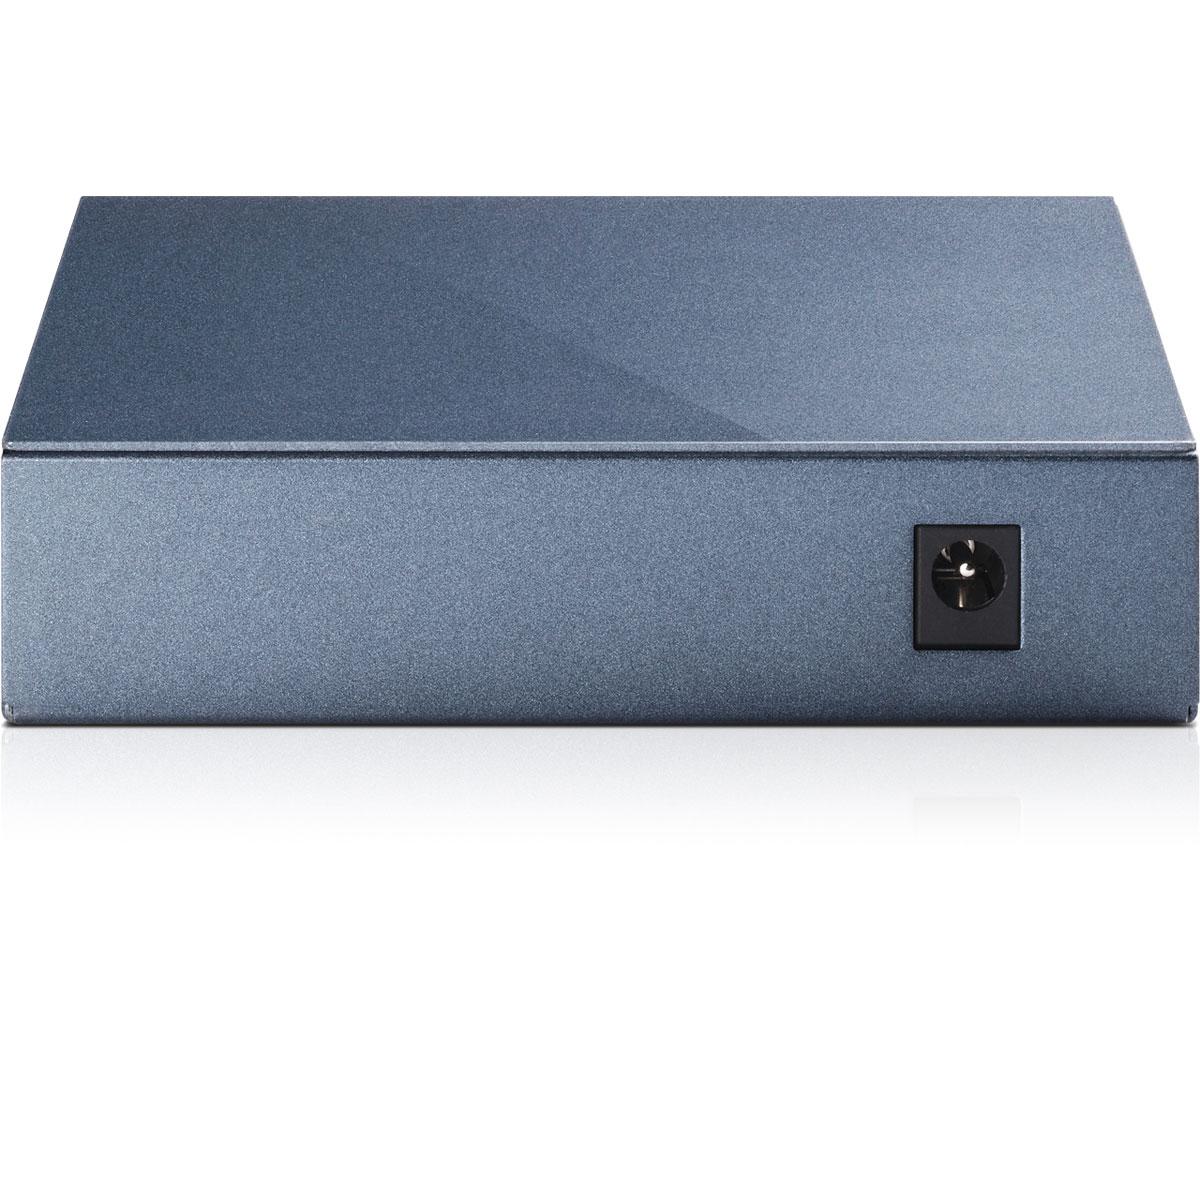 Switch TP-Link 5 ports 10/100/1000 - TL-SG105 - Cybertek.fr - 3